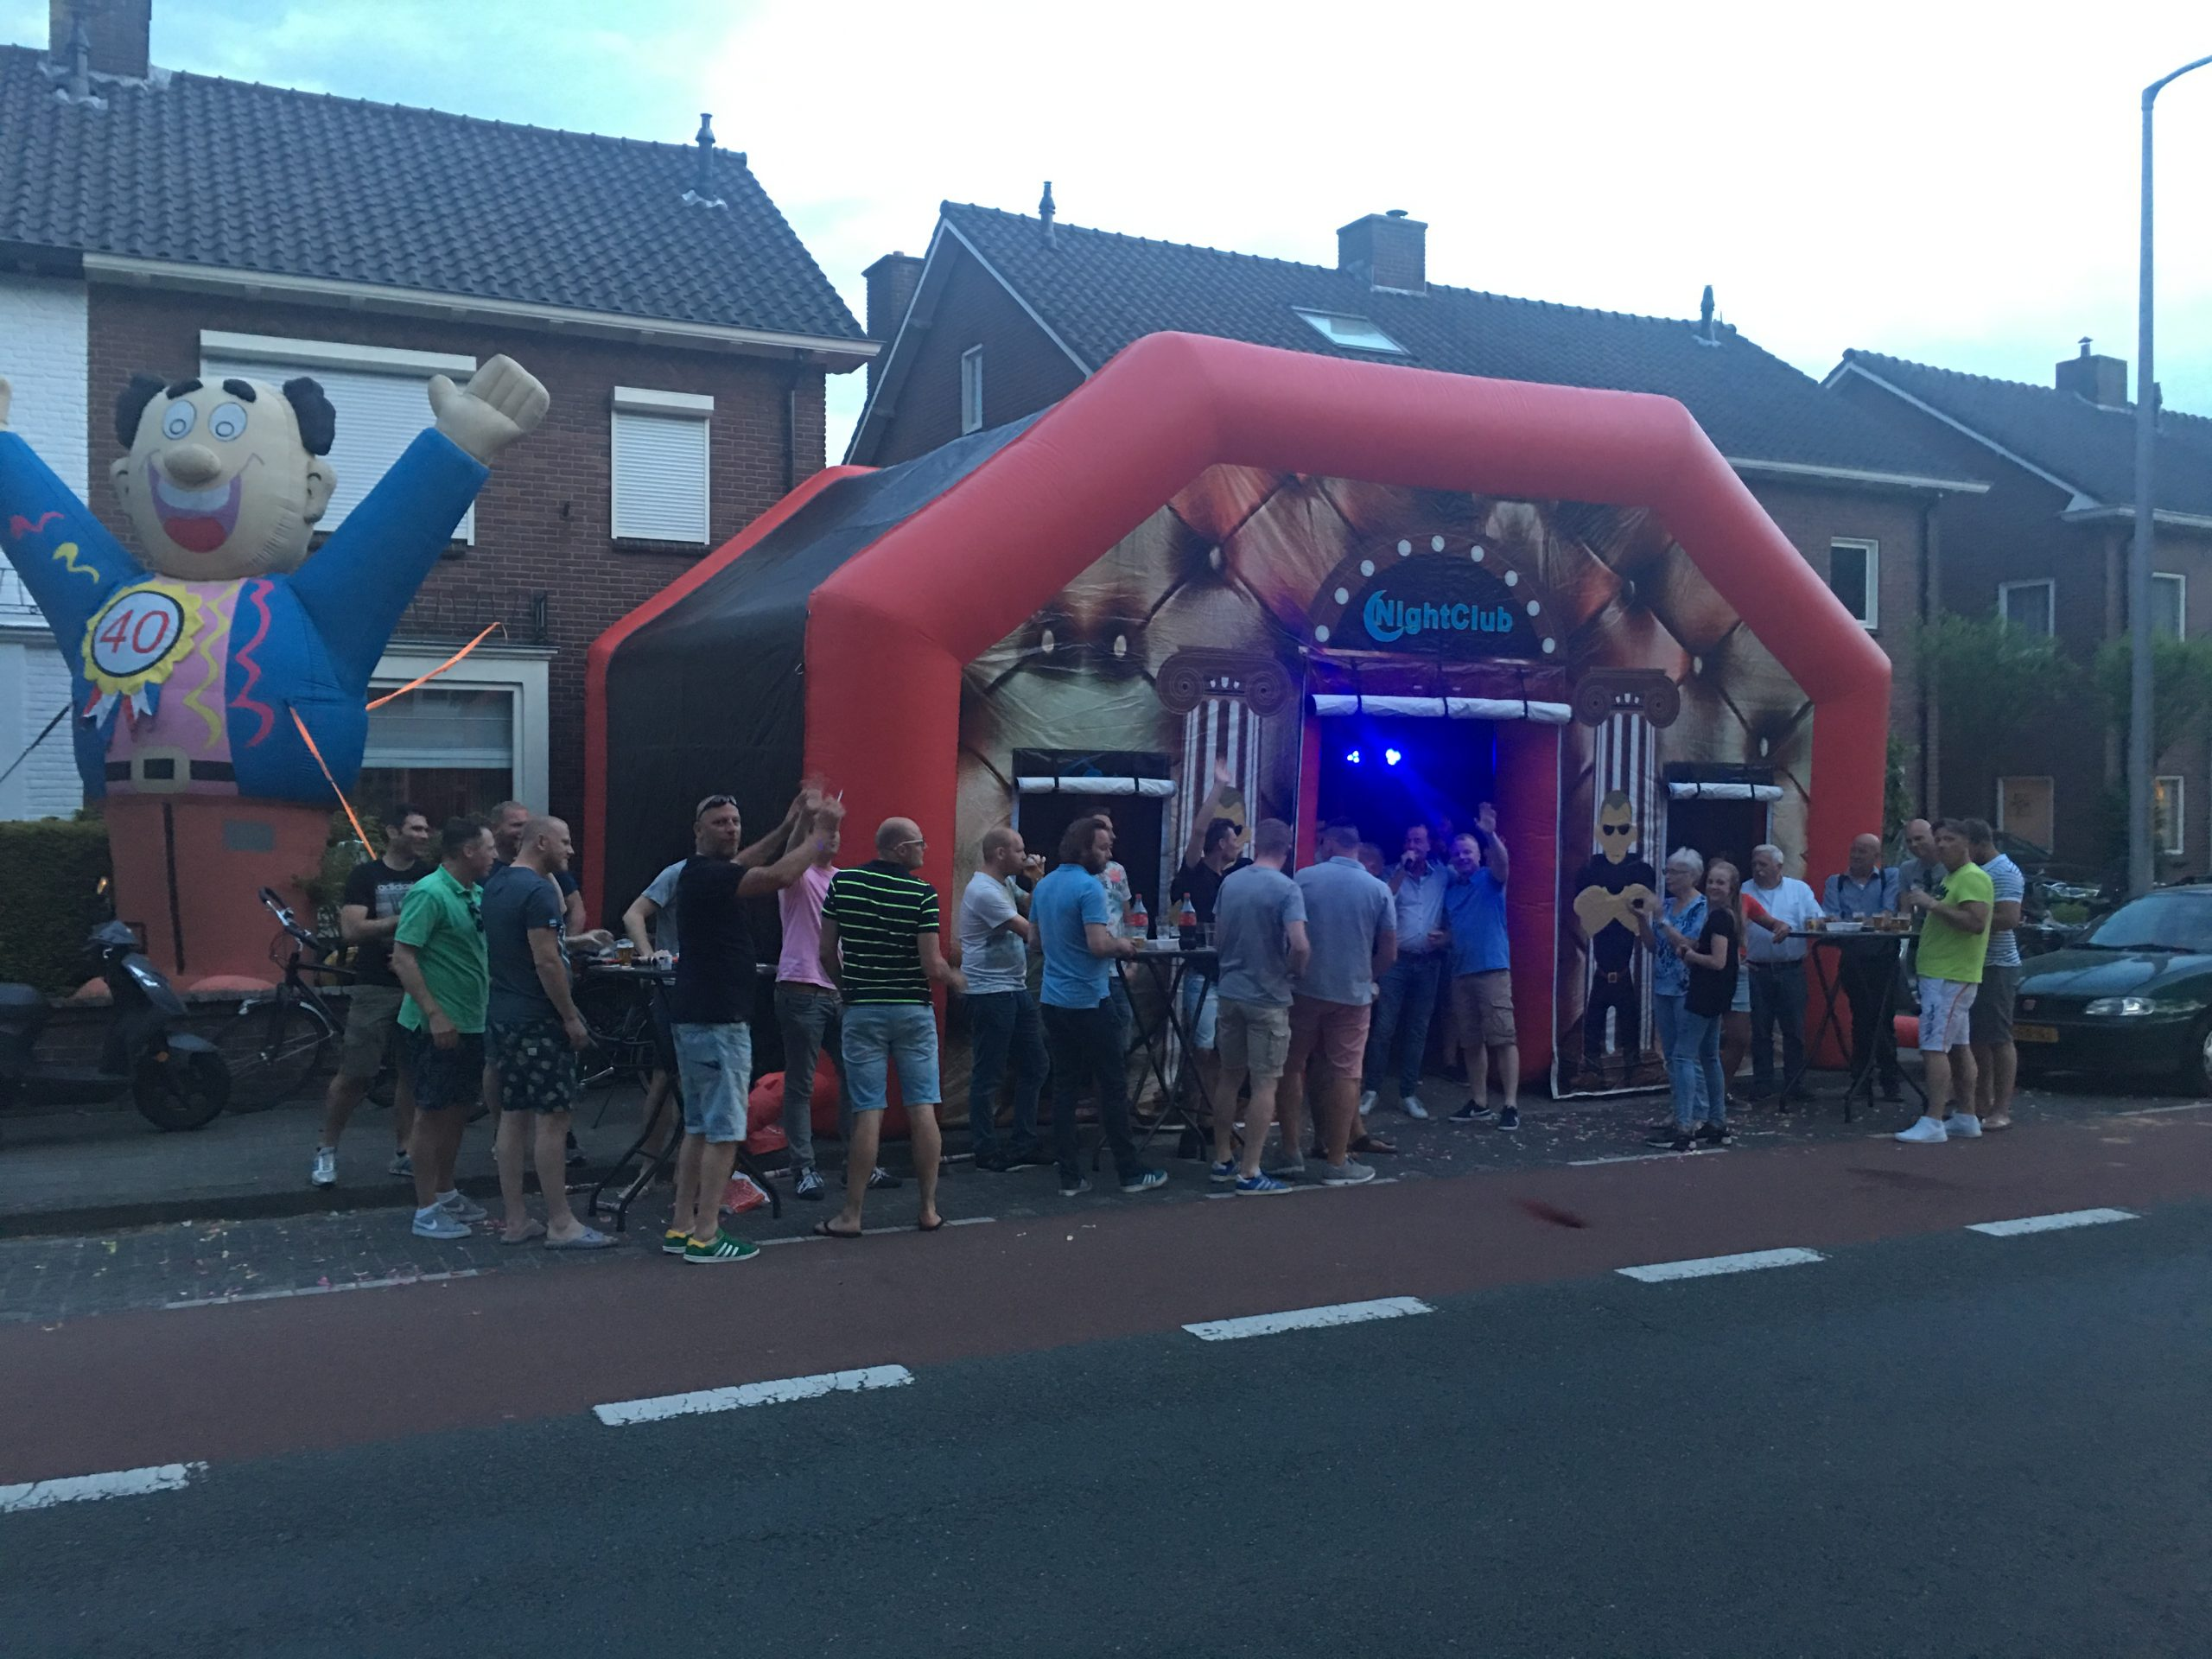 Nachtclub-te-huur-bij-X-perience-Events-Twente-4